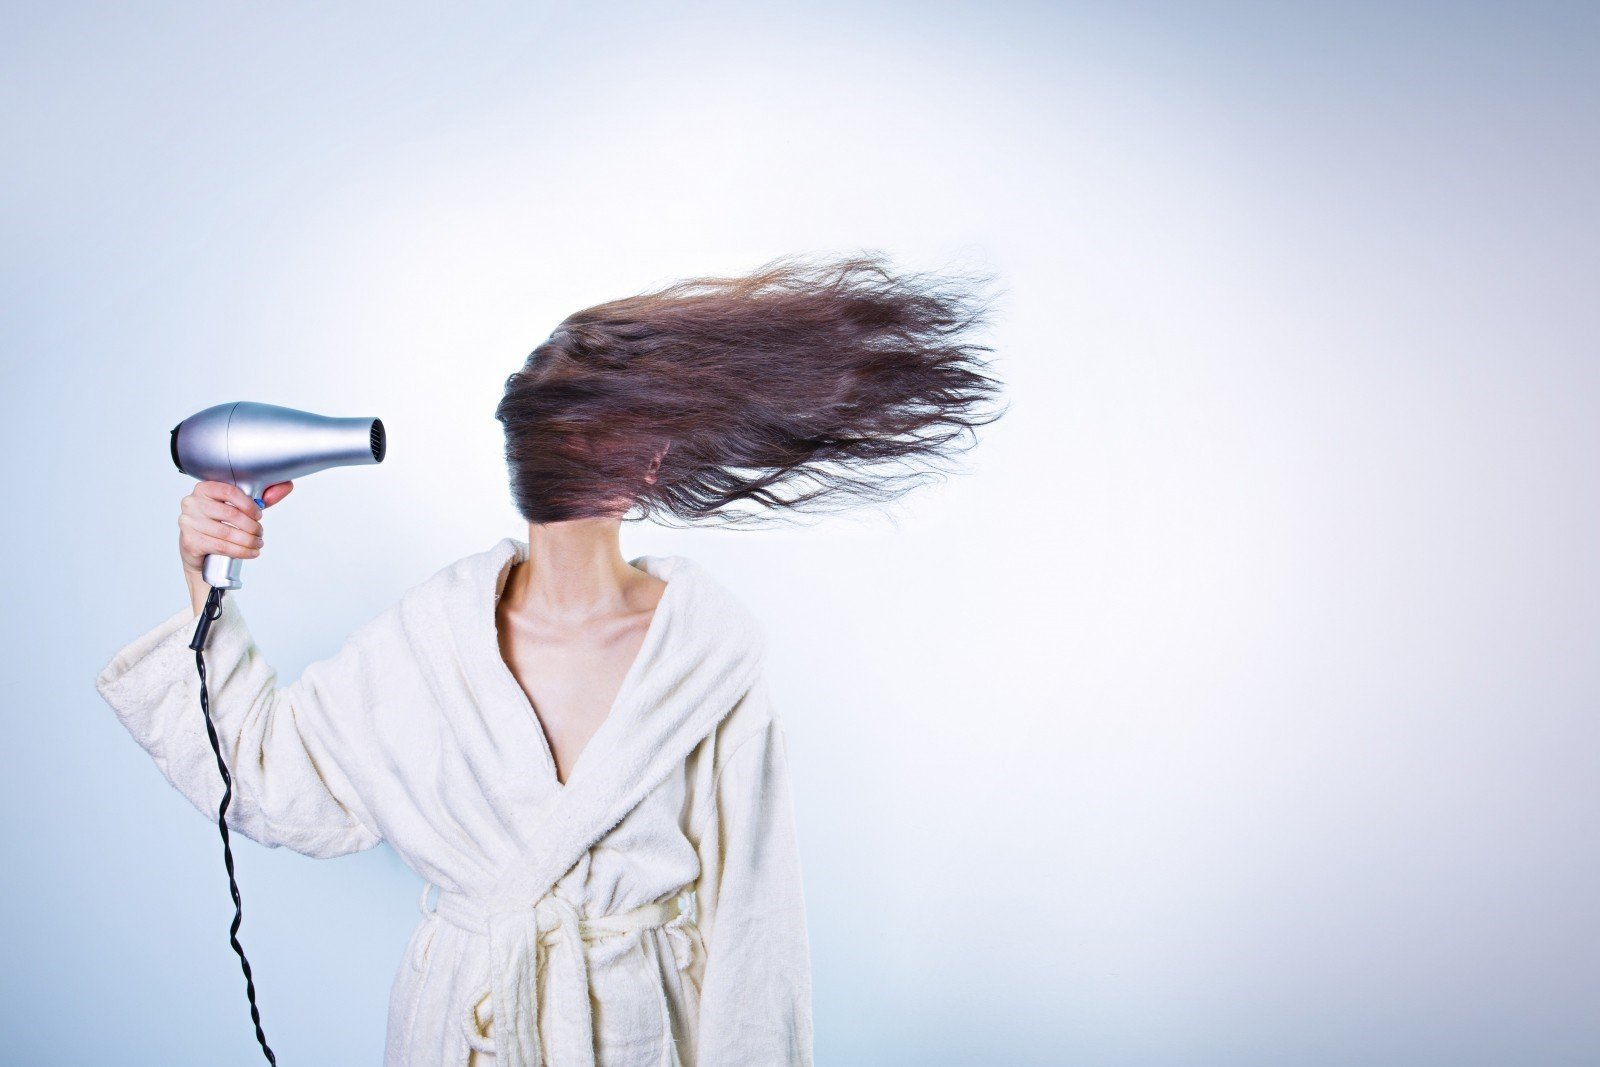 Got A Common Hair Complaint? We've Got The Solutions.